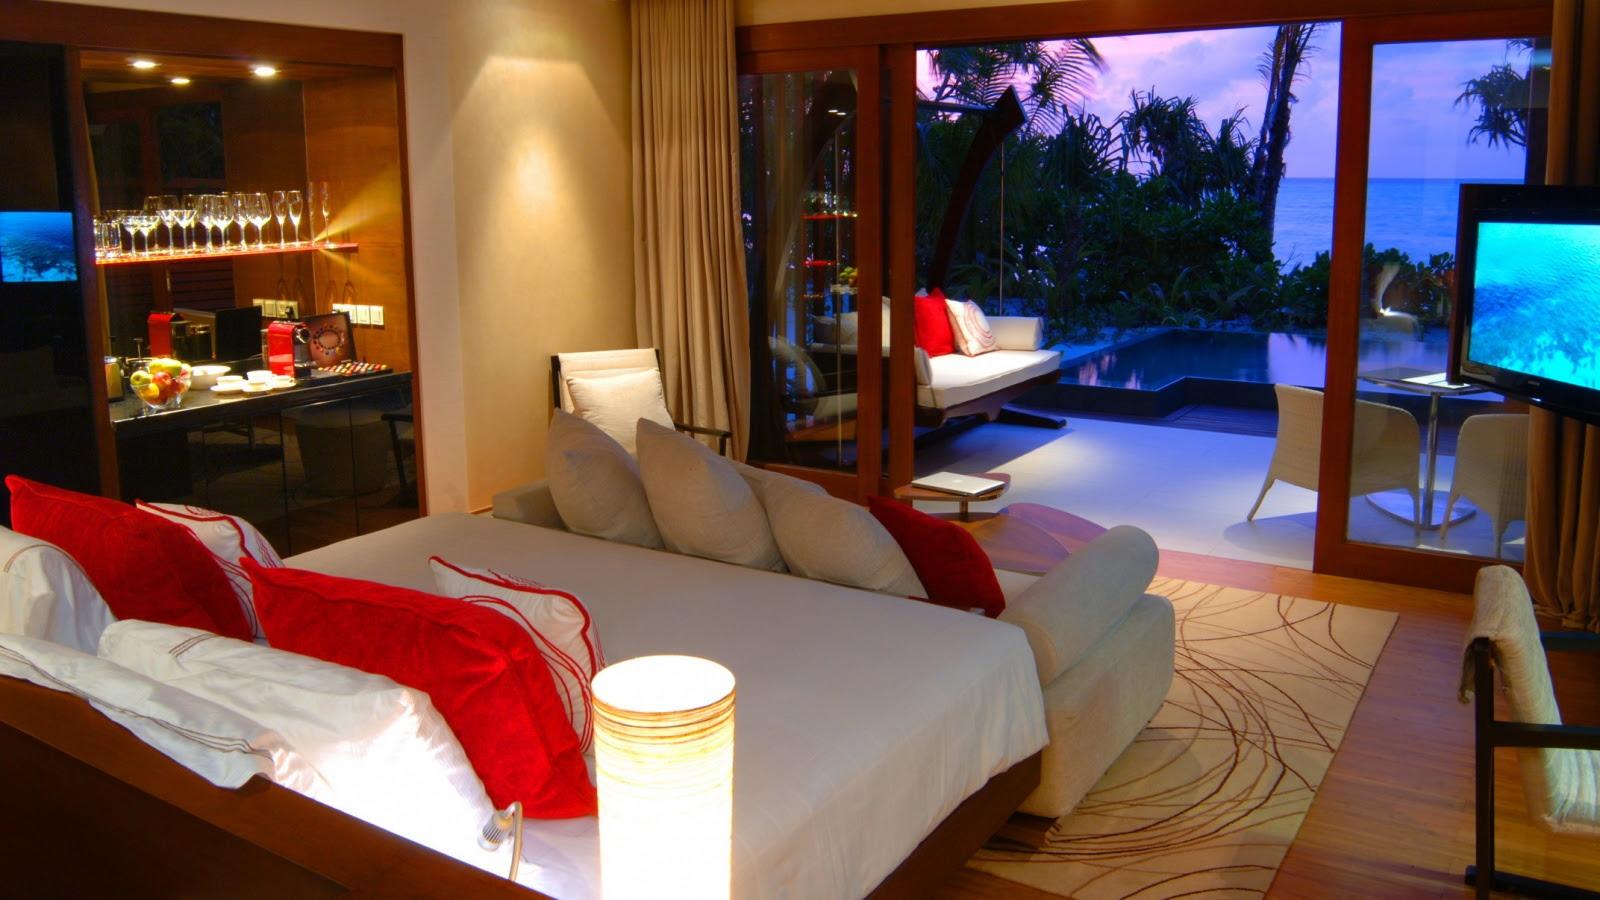 Top 21 Modern Bedrooms for 2014 - Qnud